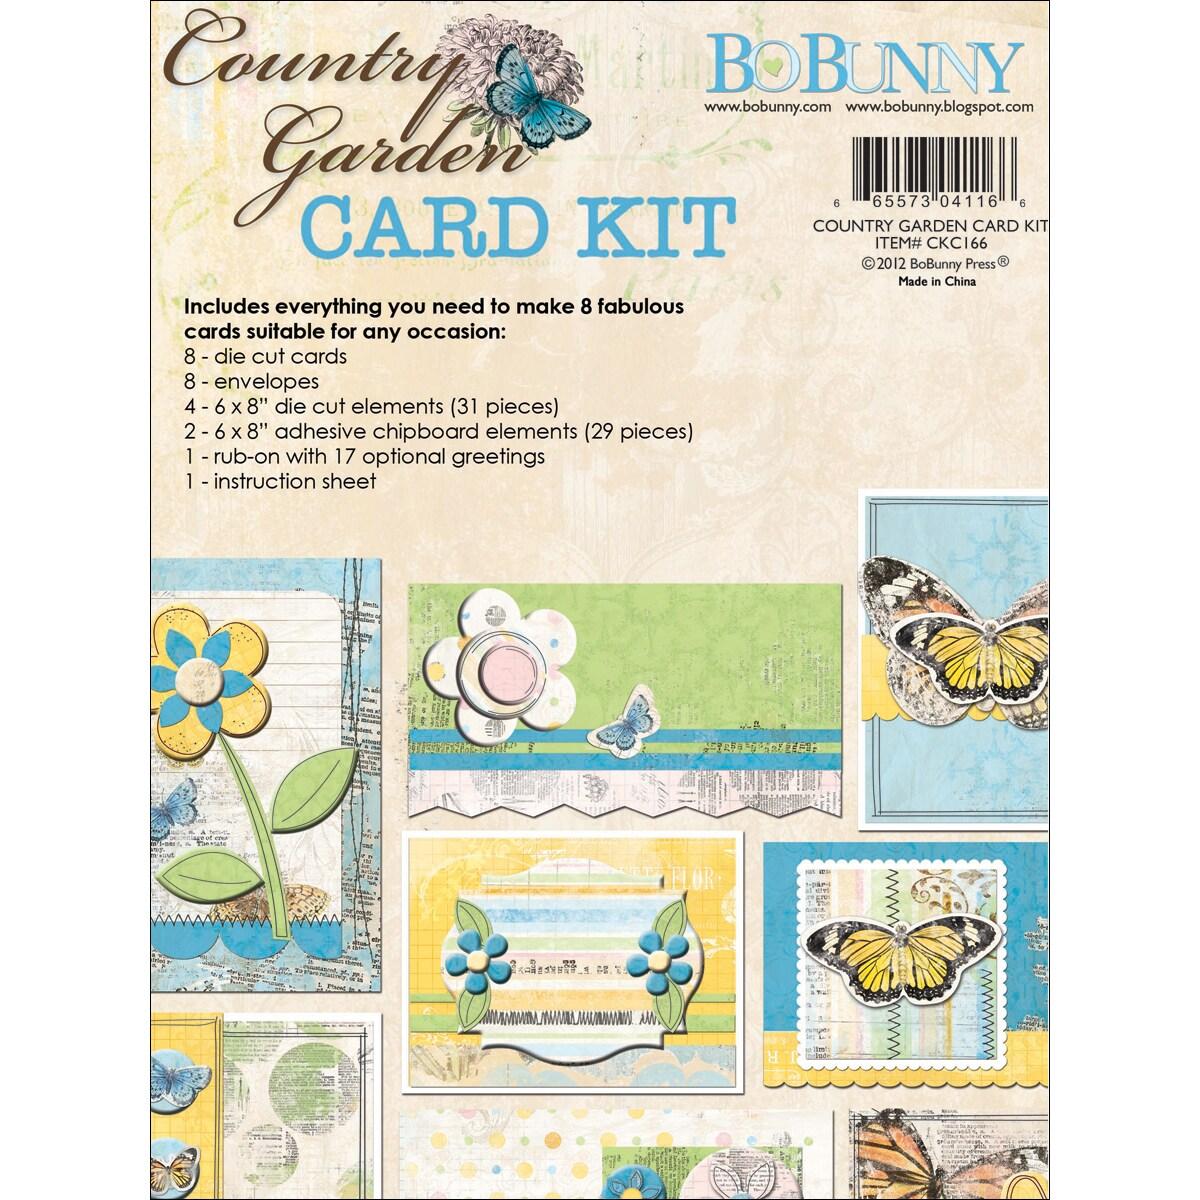 Country Garden Card Kit